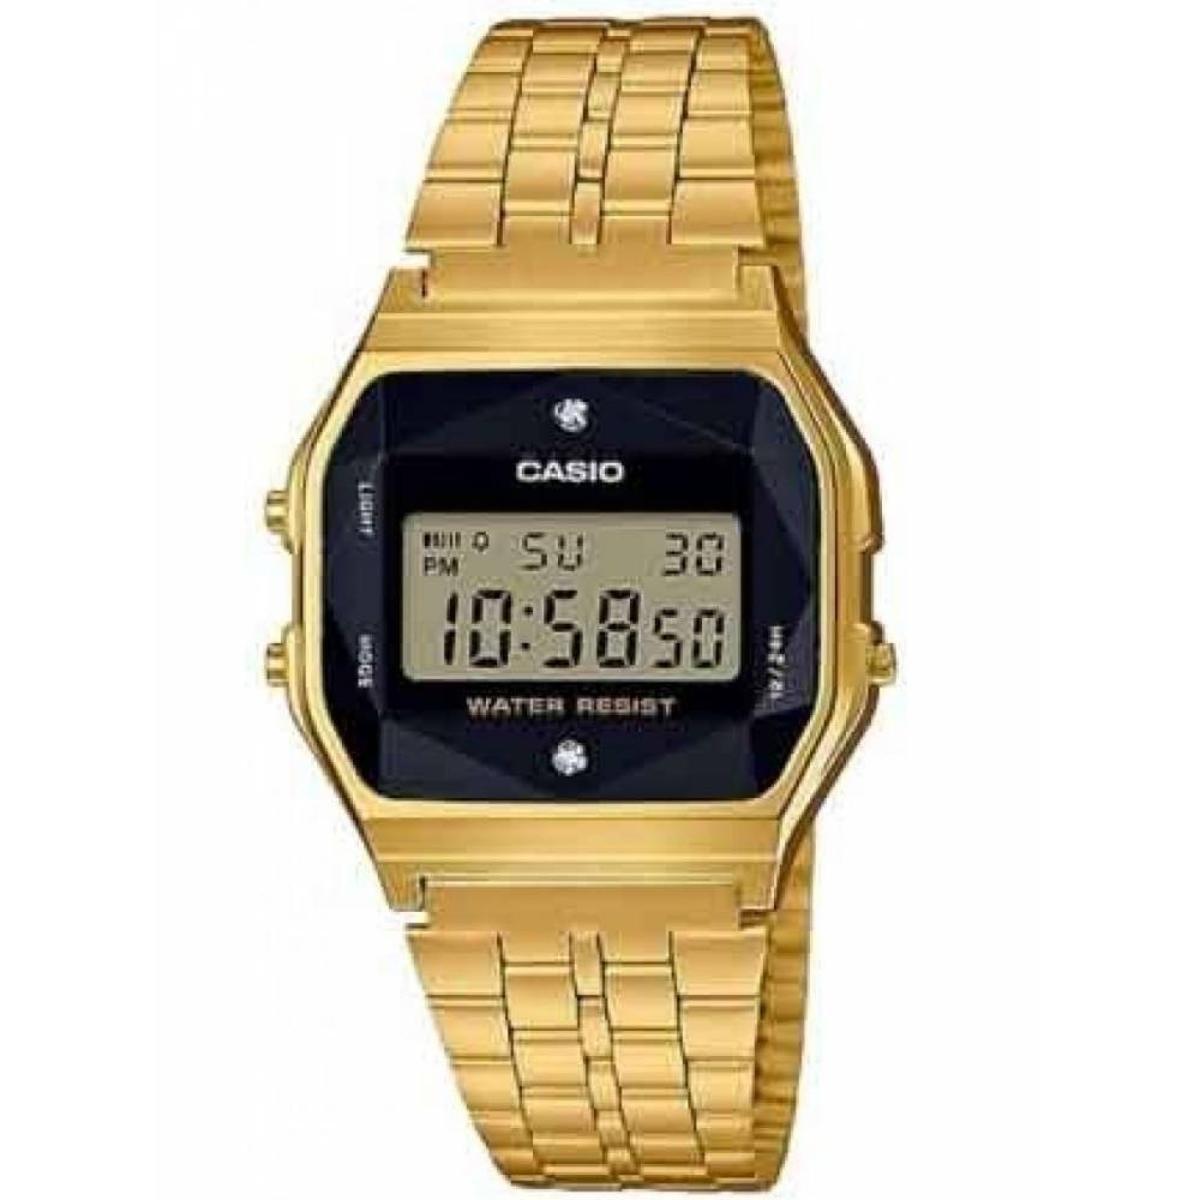 a160b83a9c8 Relógio Casio Vintage Diamond Feminino - Compre Agora